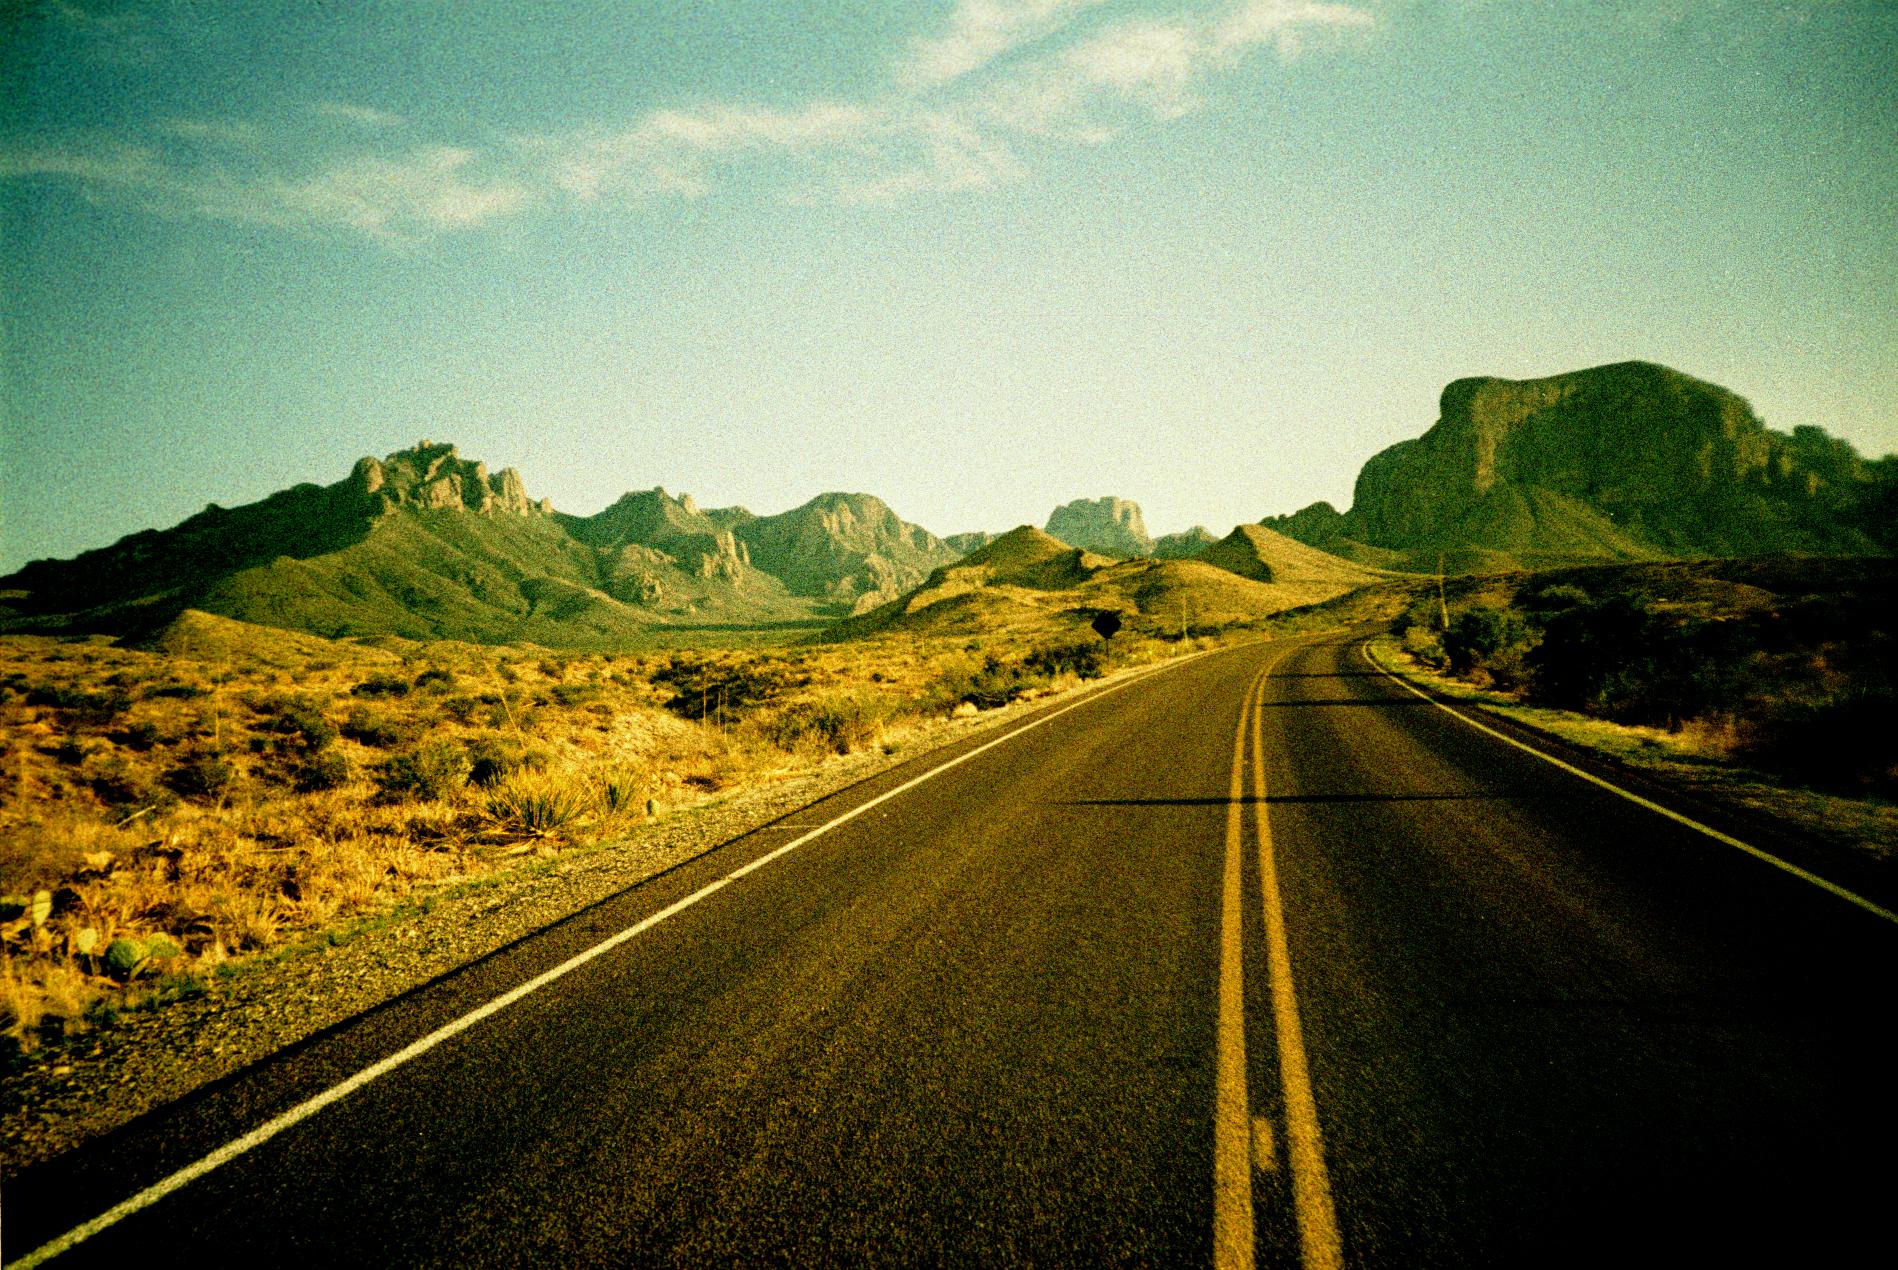 roadtrip.lomo2012.05_10015.jpg